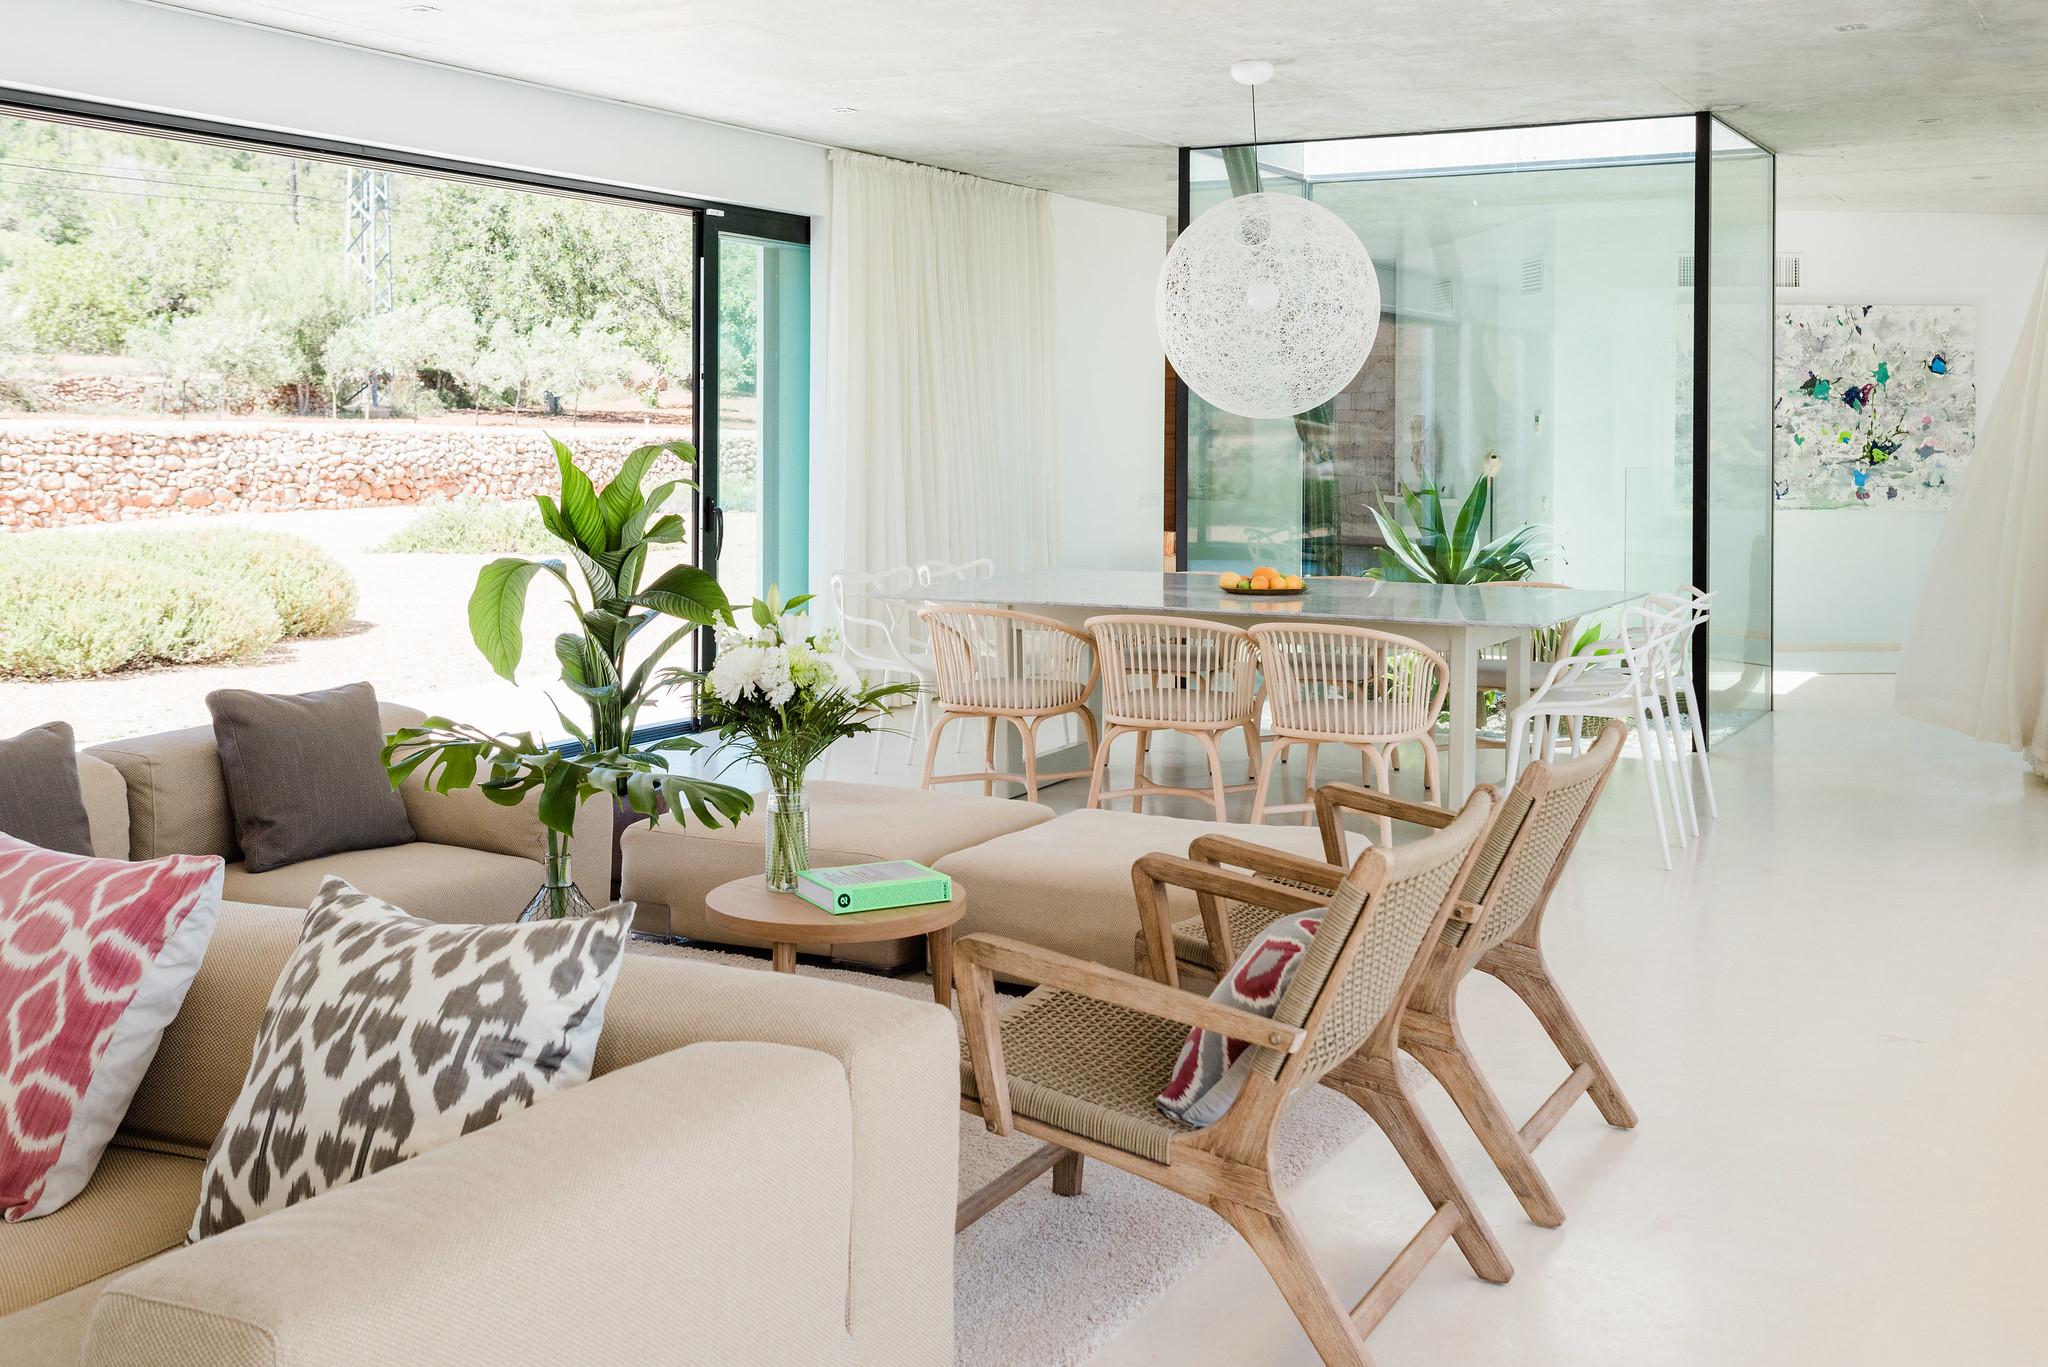 https://www.white-ibiza.com/wp-content/uploads/2020/06/white-ibiza-villas-can-carmen-interior-living-space.jpg